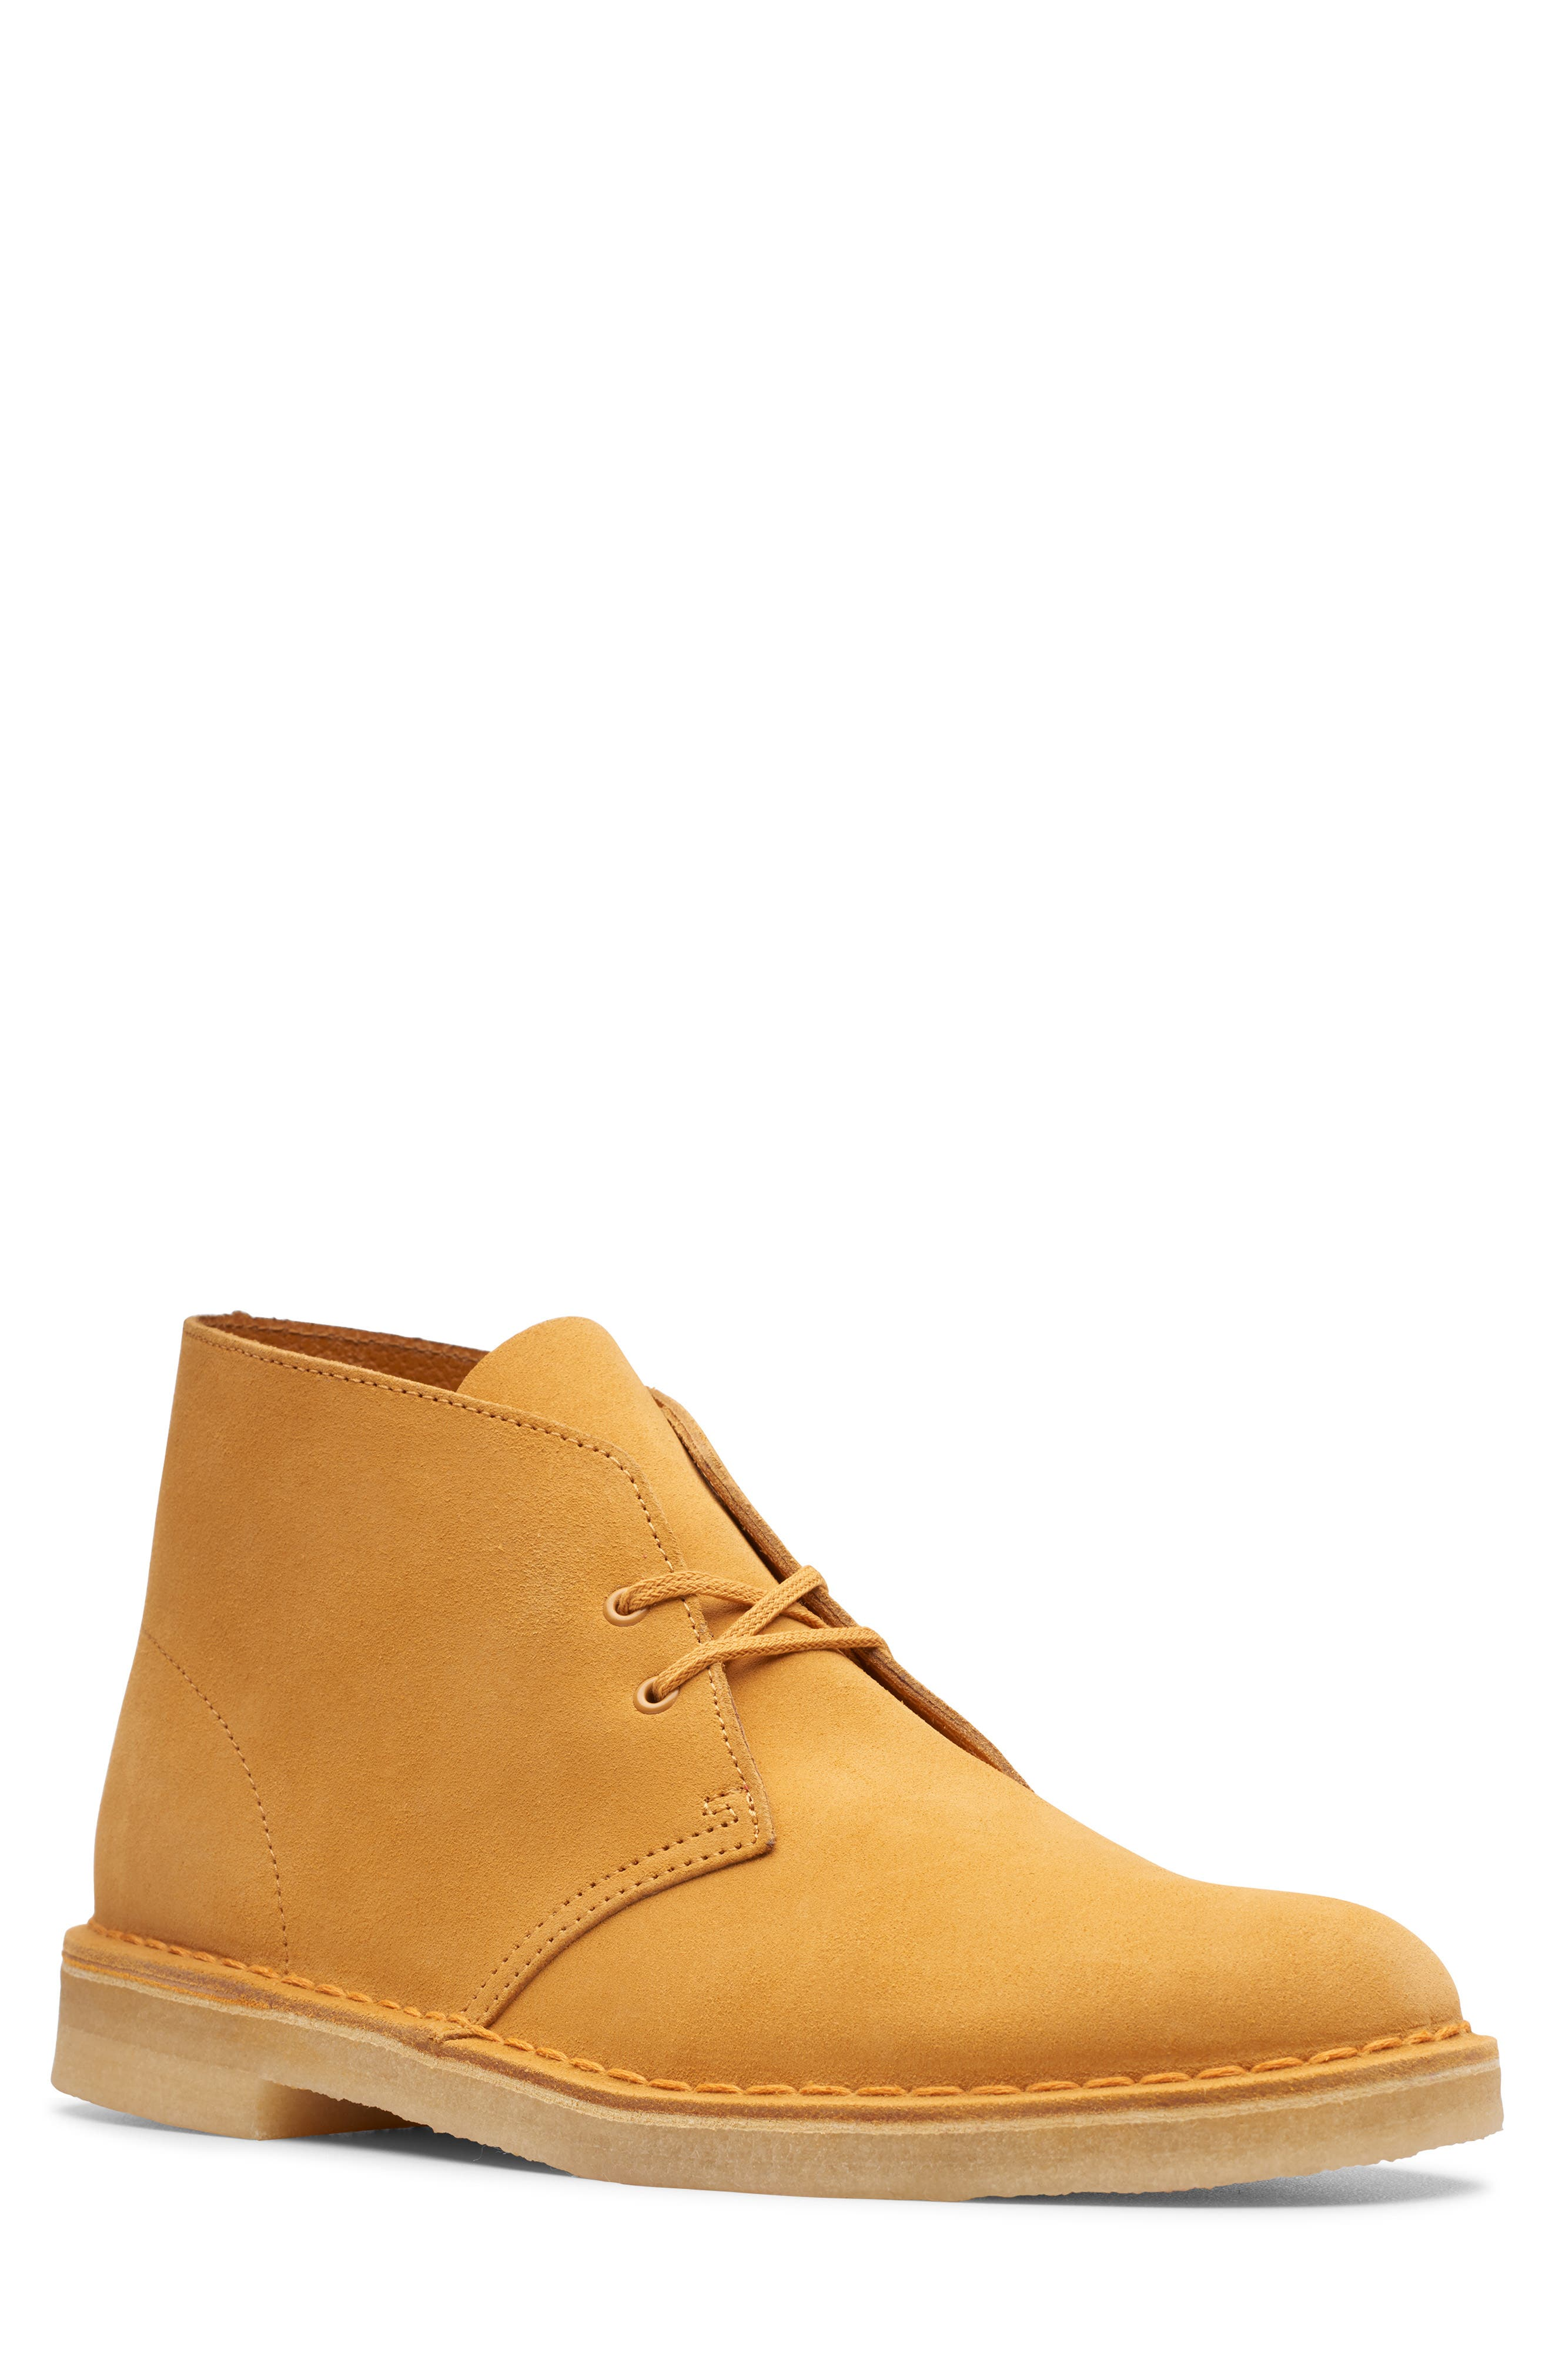 CLARKS<SUP>®</SUP> Originals 'Desert' Boot, Main, color, TURMERIC/BROWN SUEDE